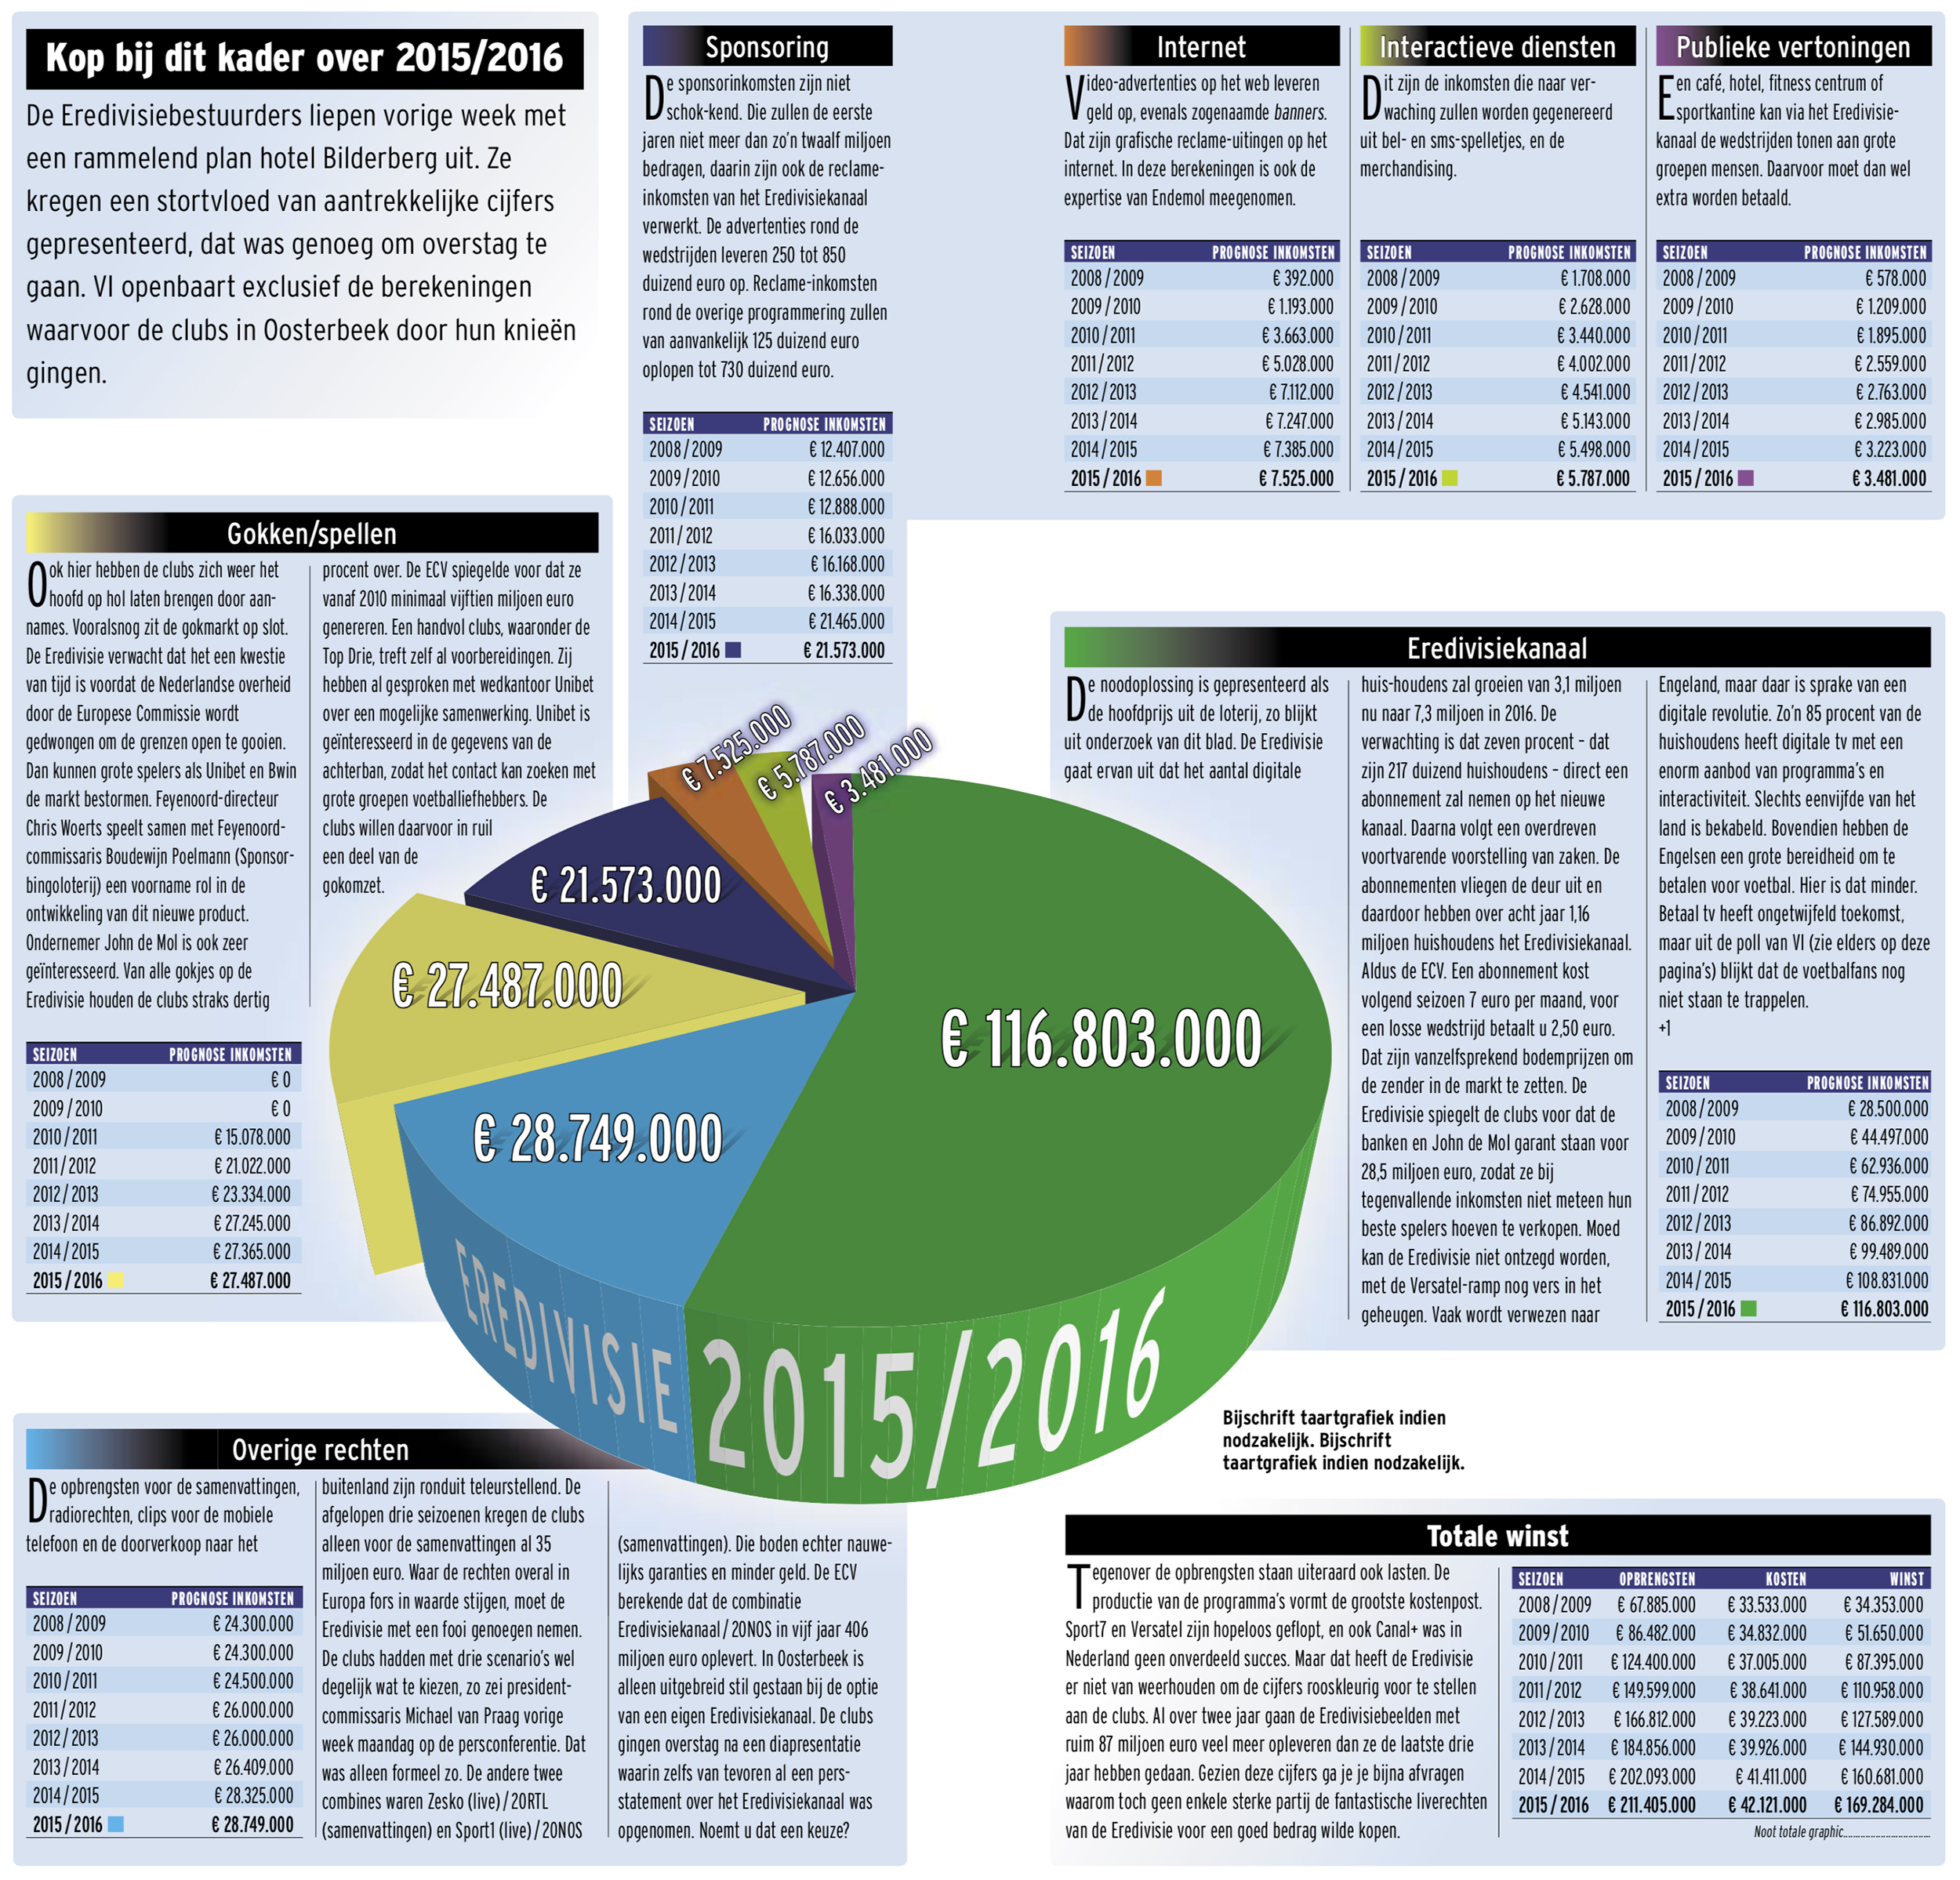 Graphic toekomstige inkomsten